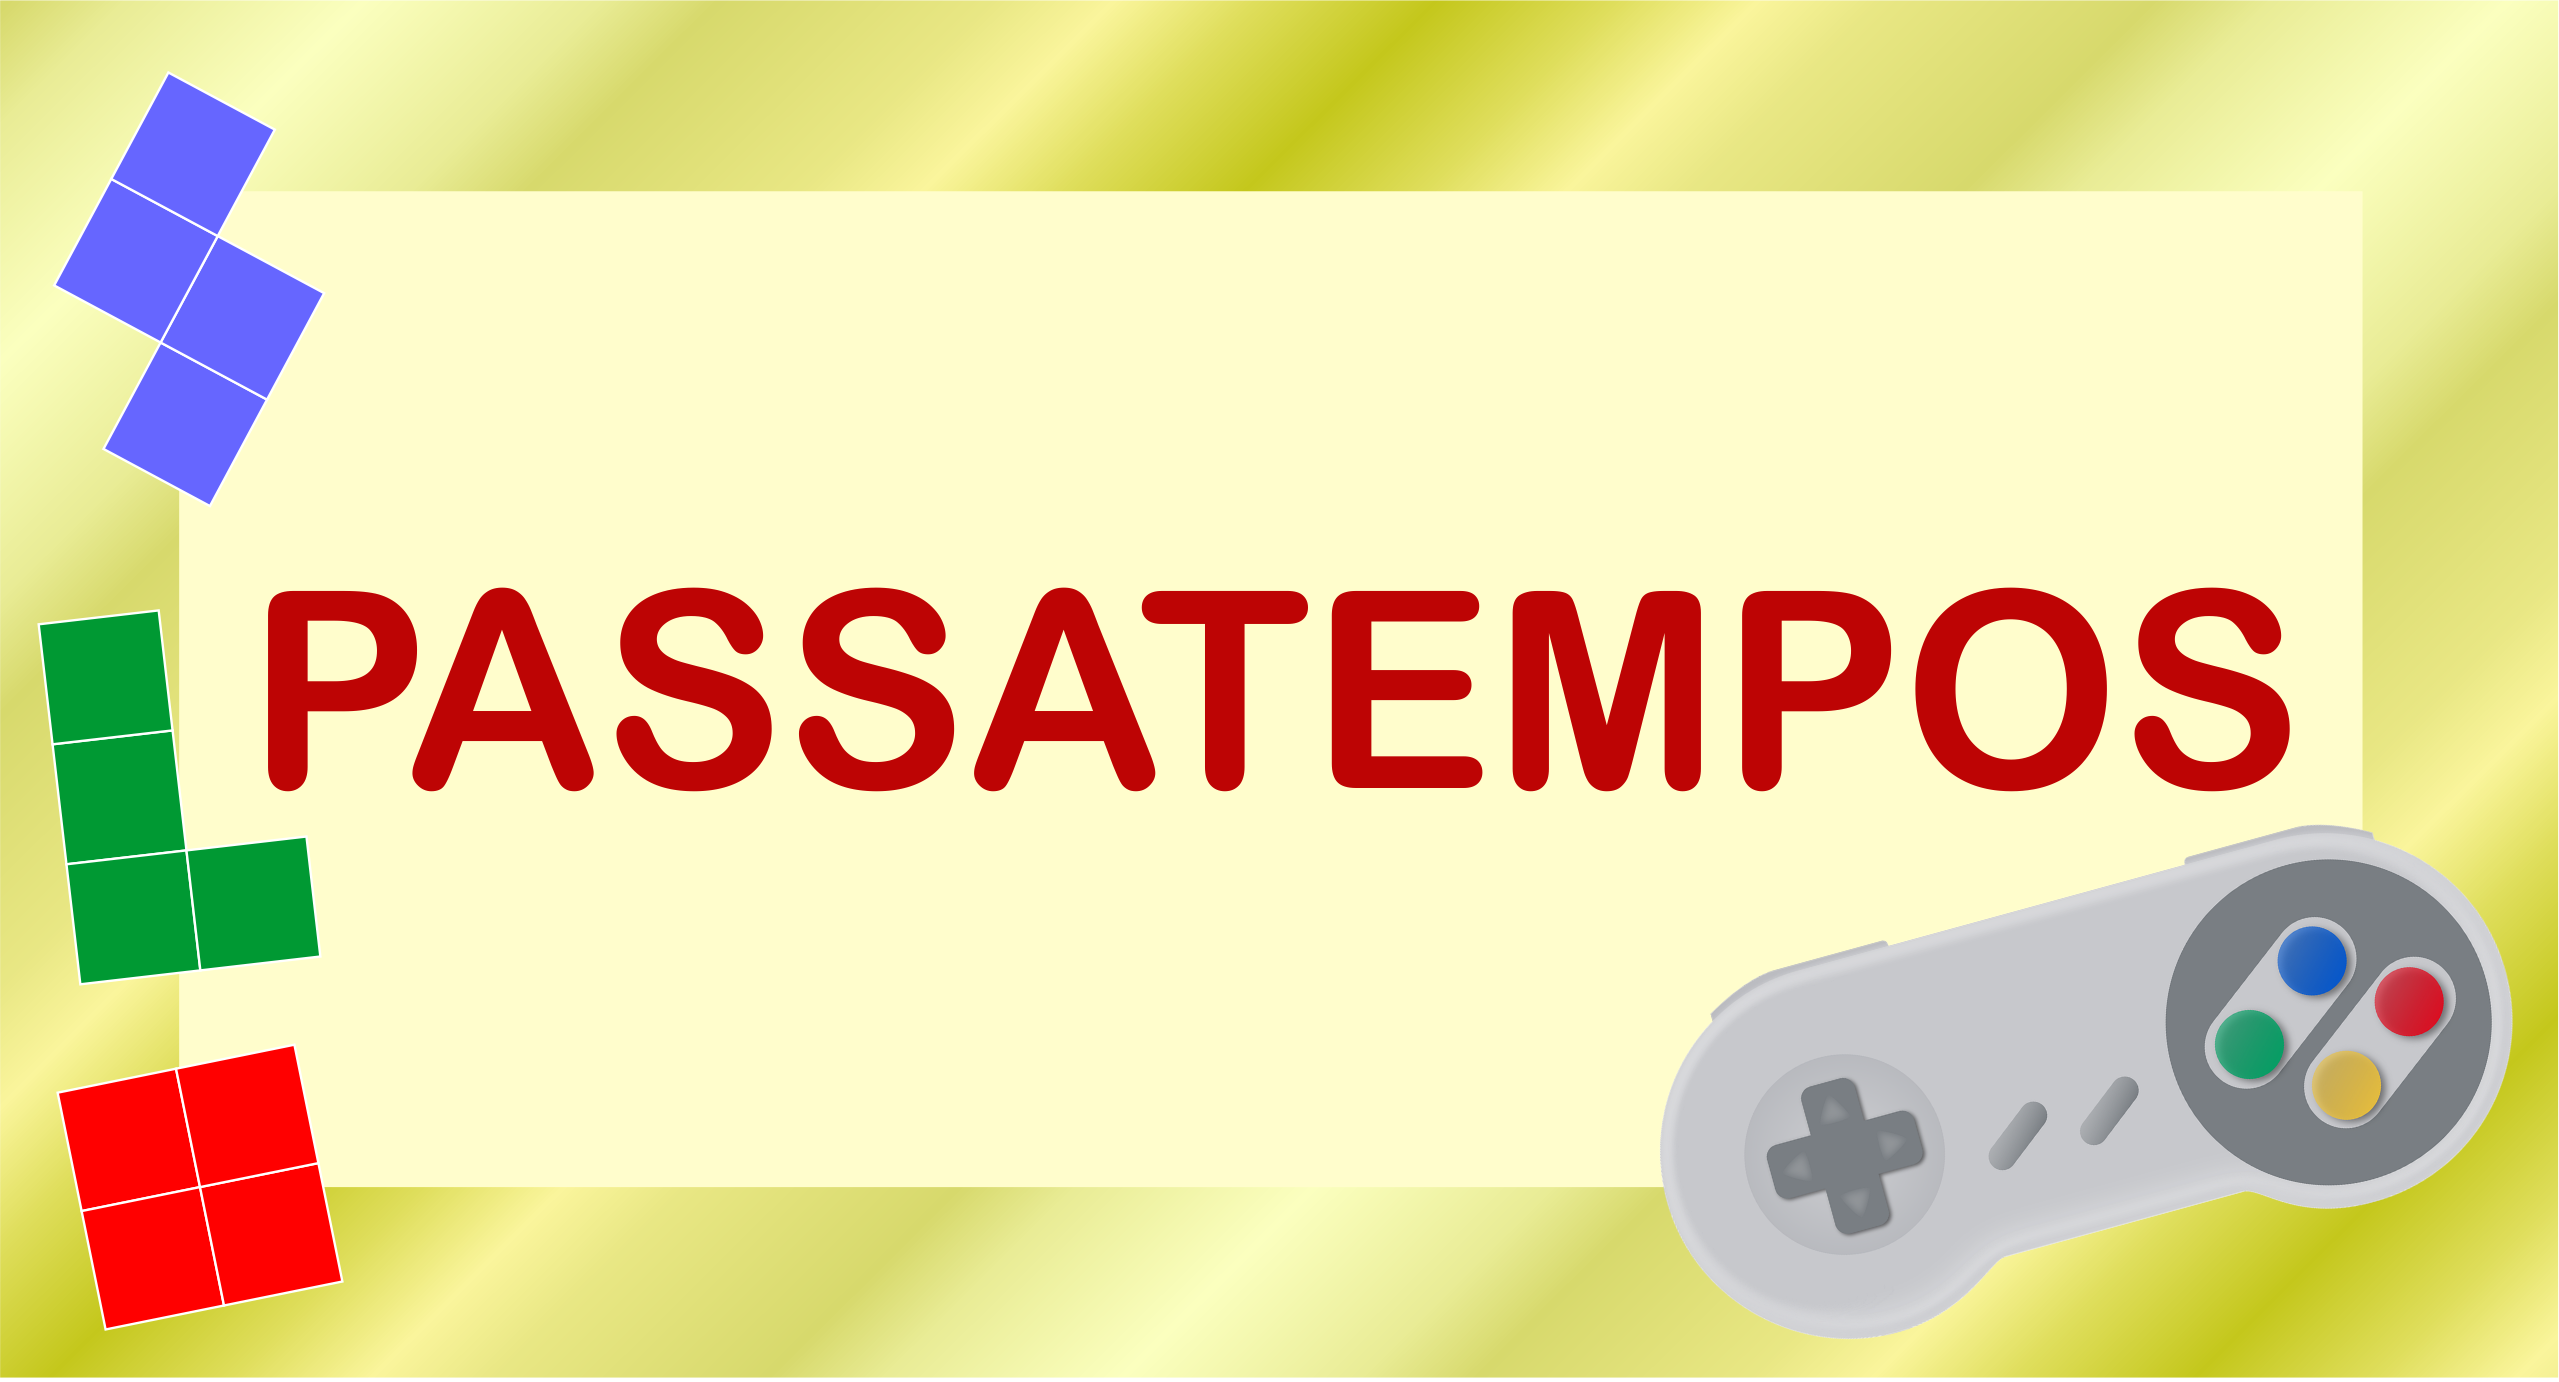 Passatempos